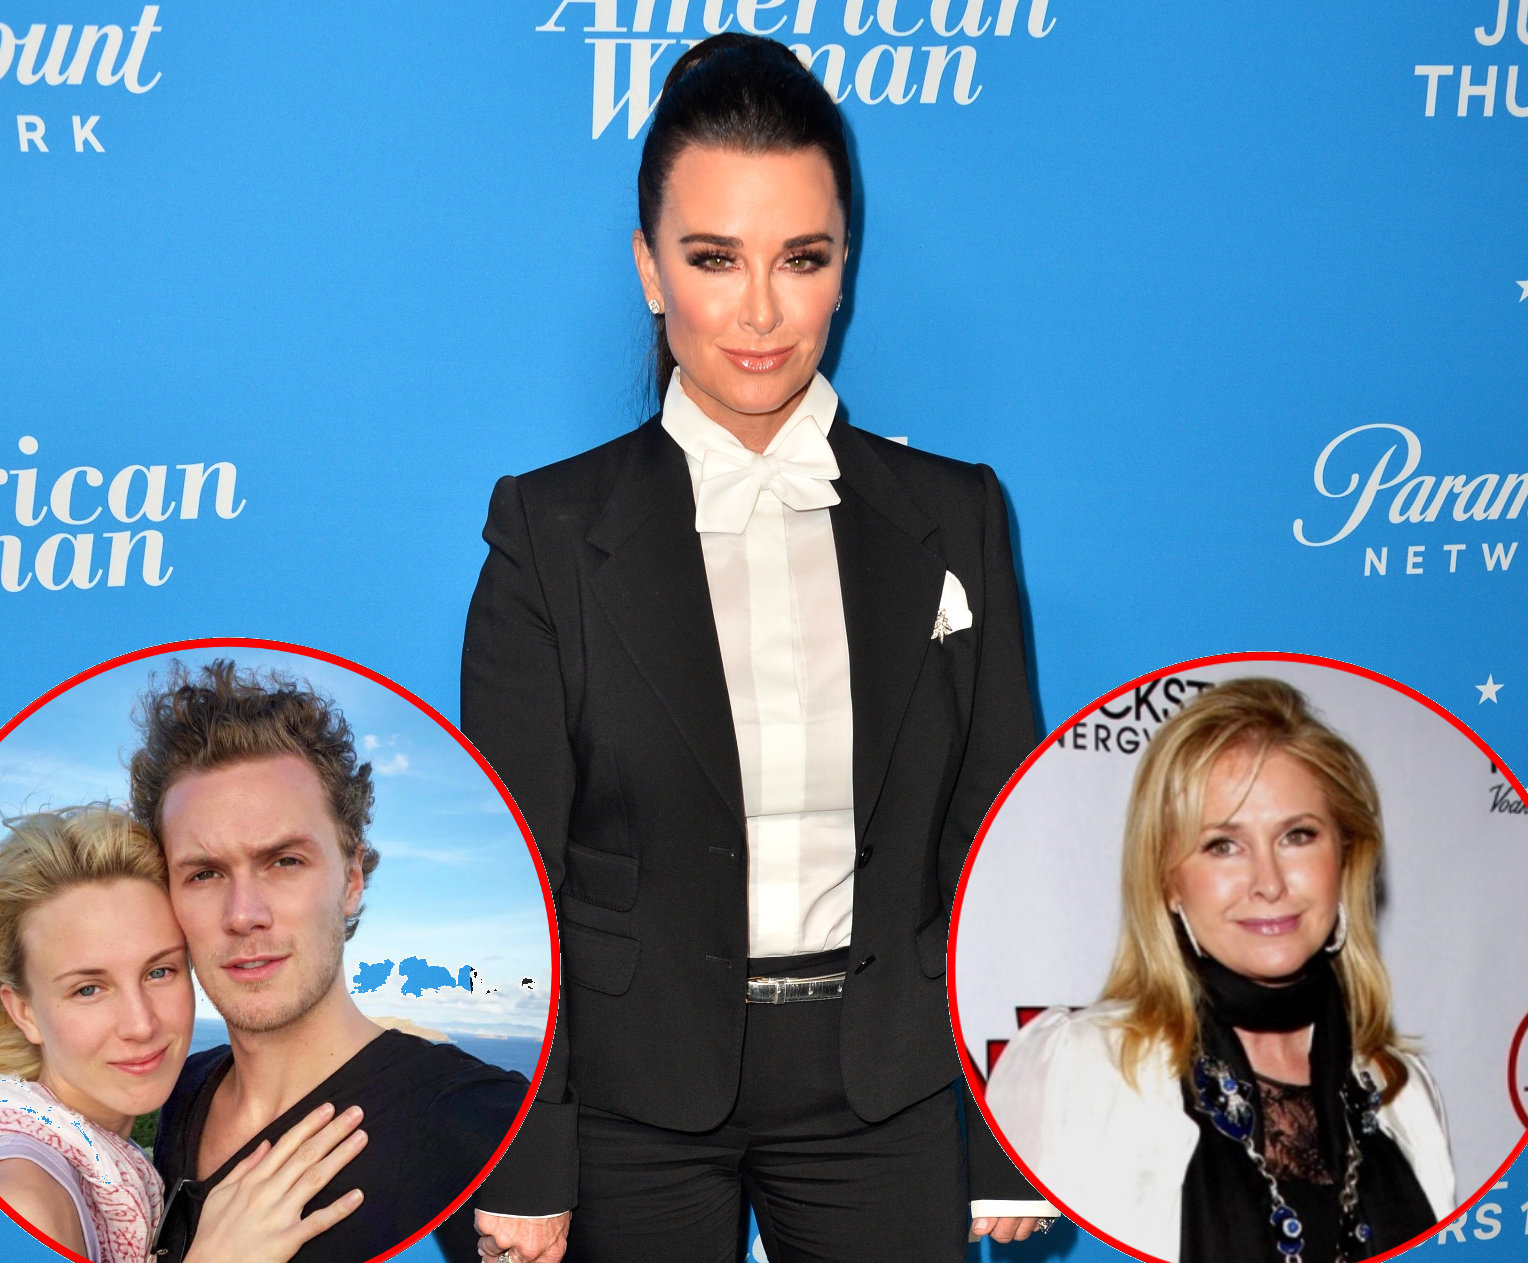 RHOBH Kyle Richards Misses Barron Hilton Wedding Amid Kathy Hilton Feud